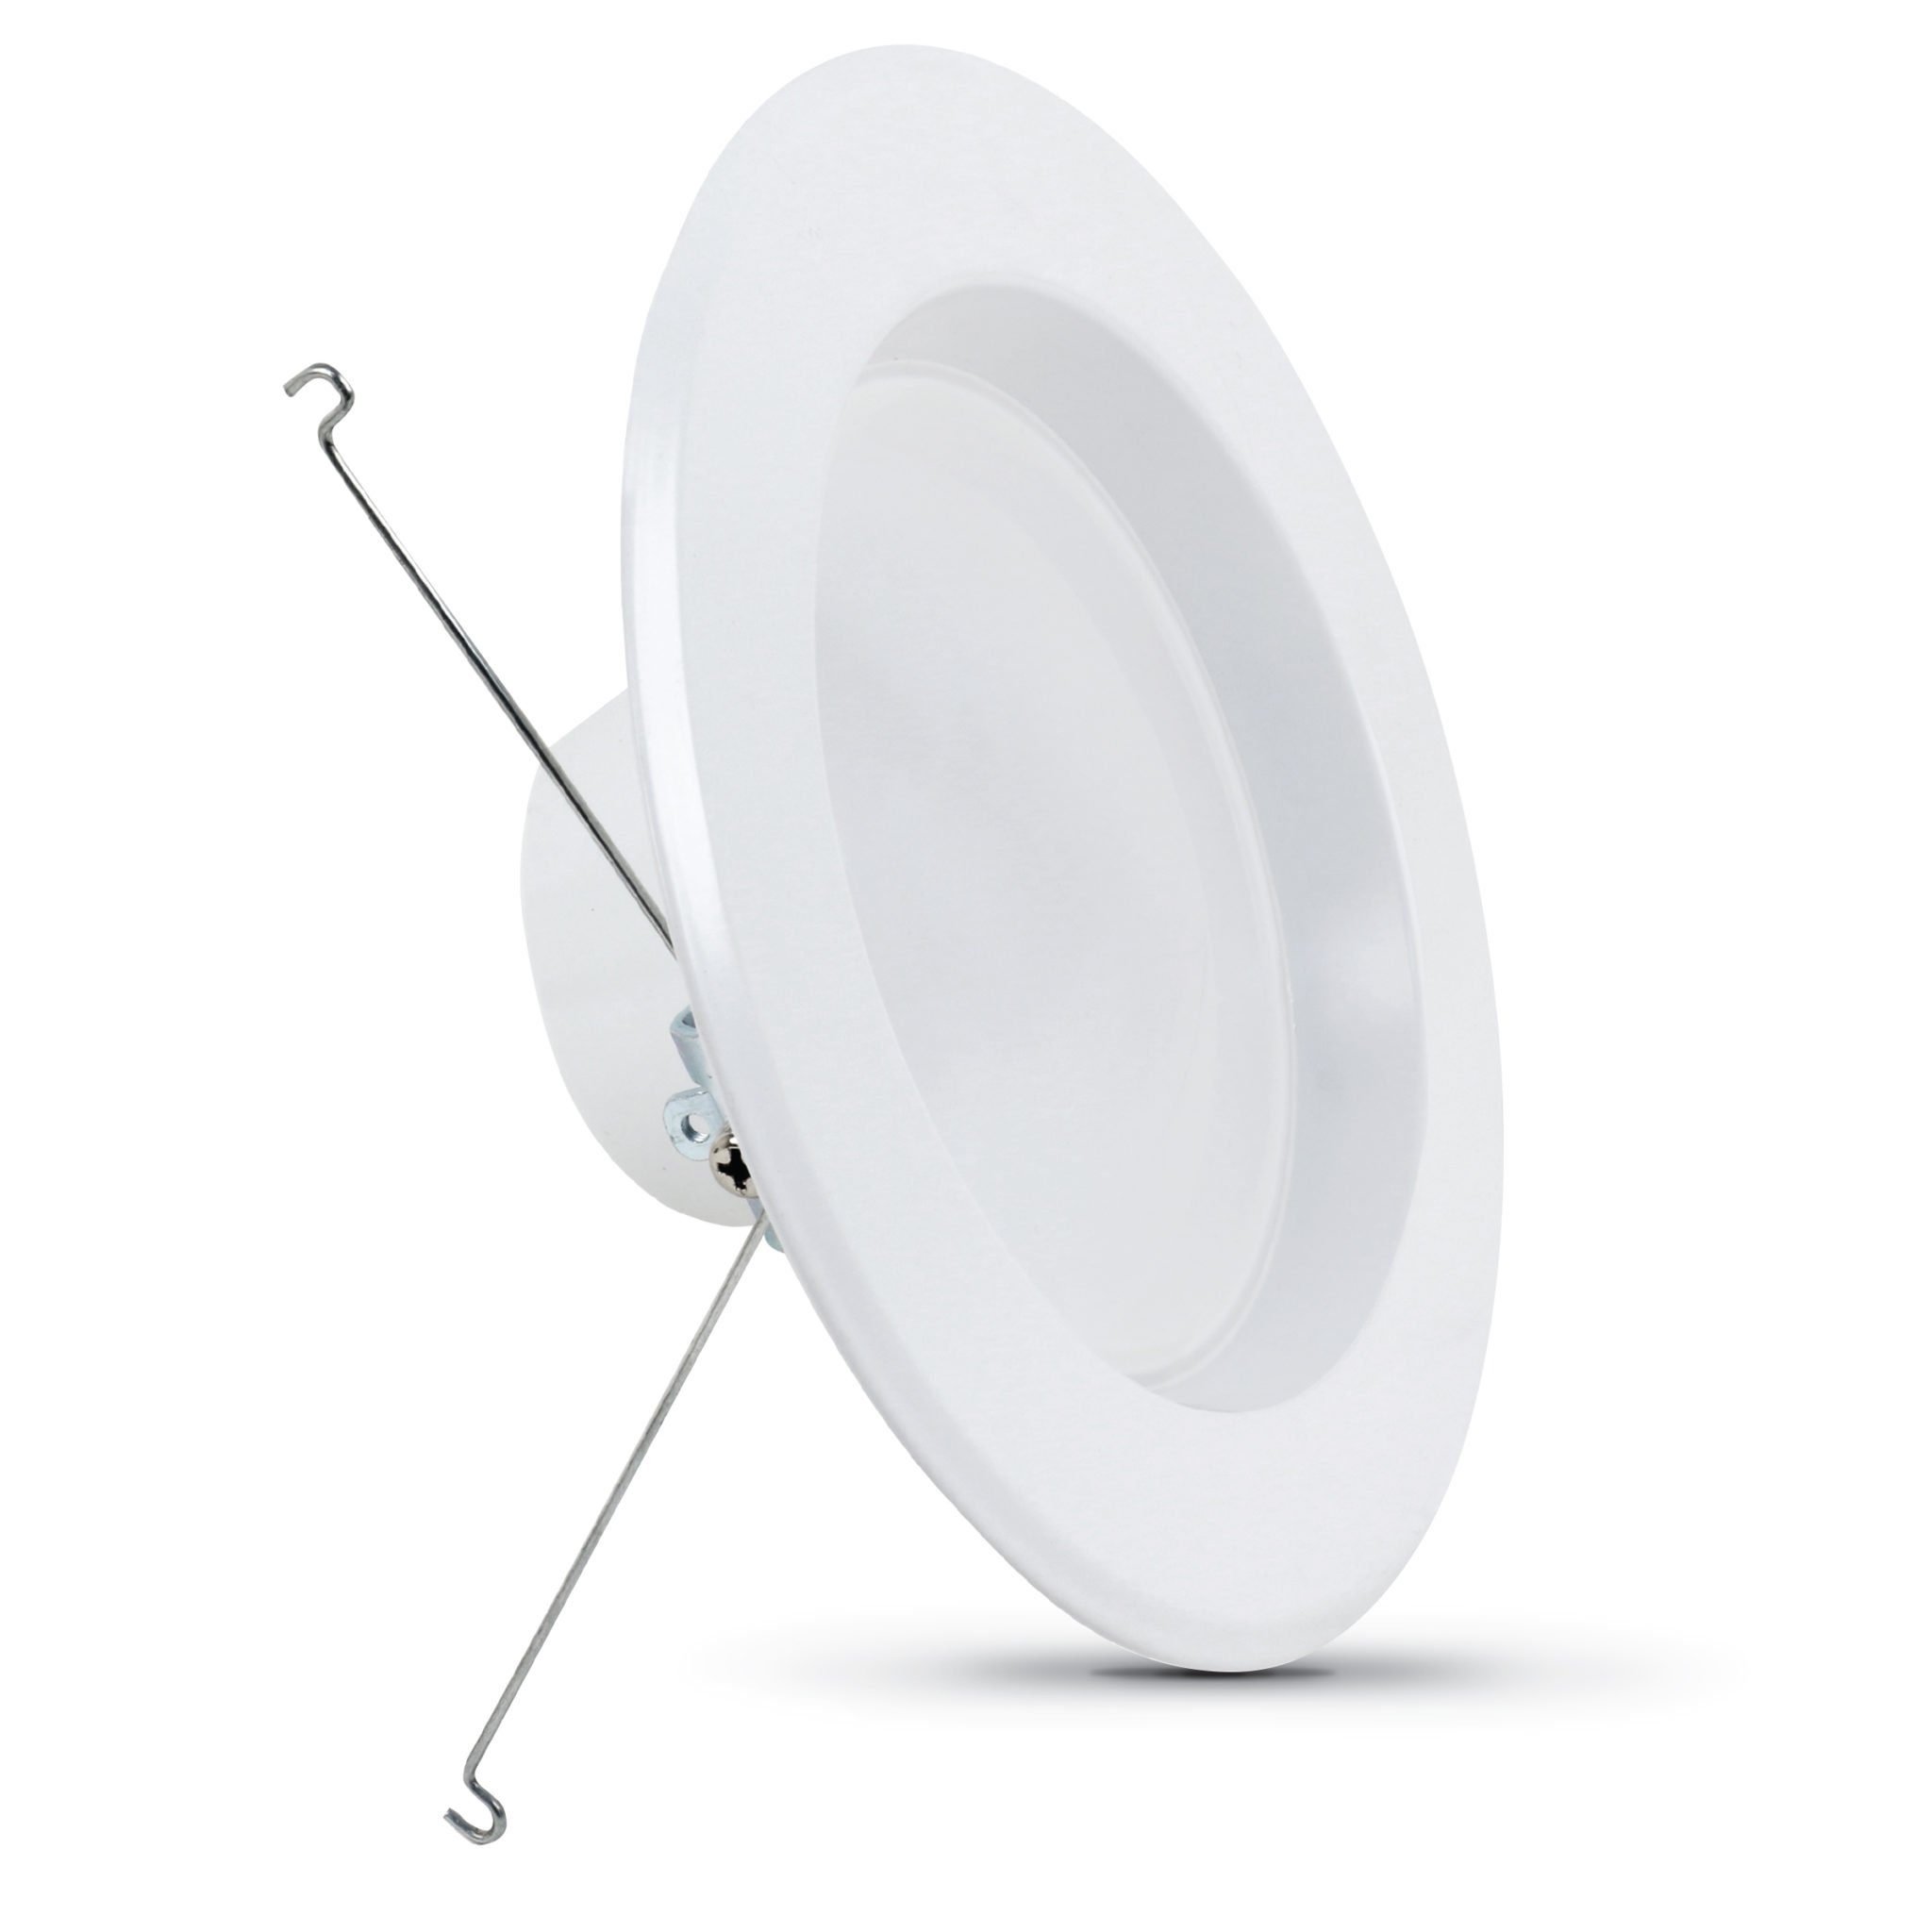 FEIT LEDR56HO/950CA 1290 Lumen 5000K 5-6 Inch Dimmable Retrofit Kit - Ideal for HIGH Ceilings - 6-Pack by FEIT